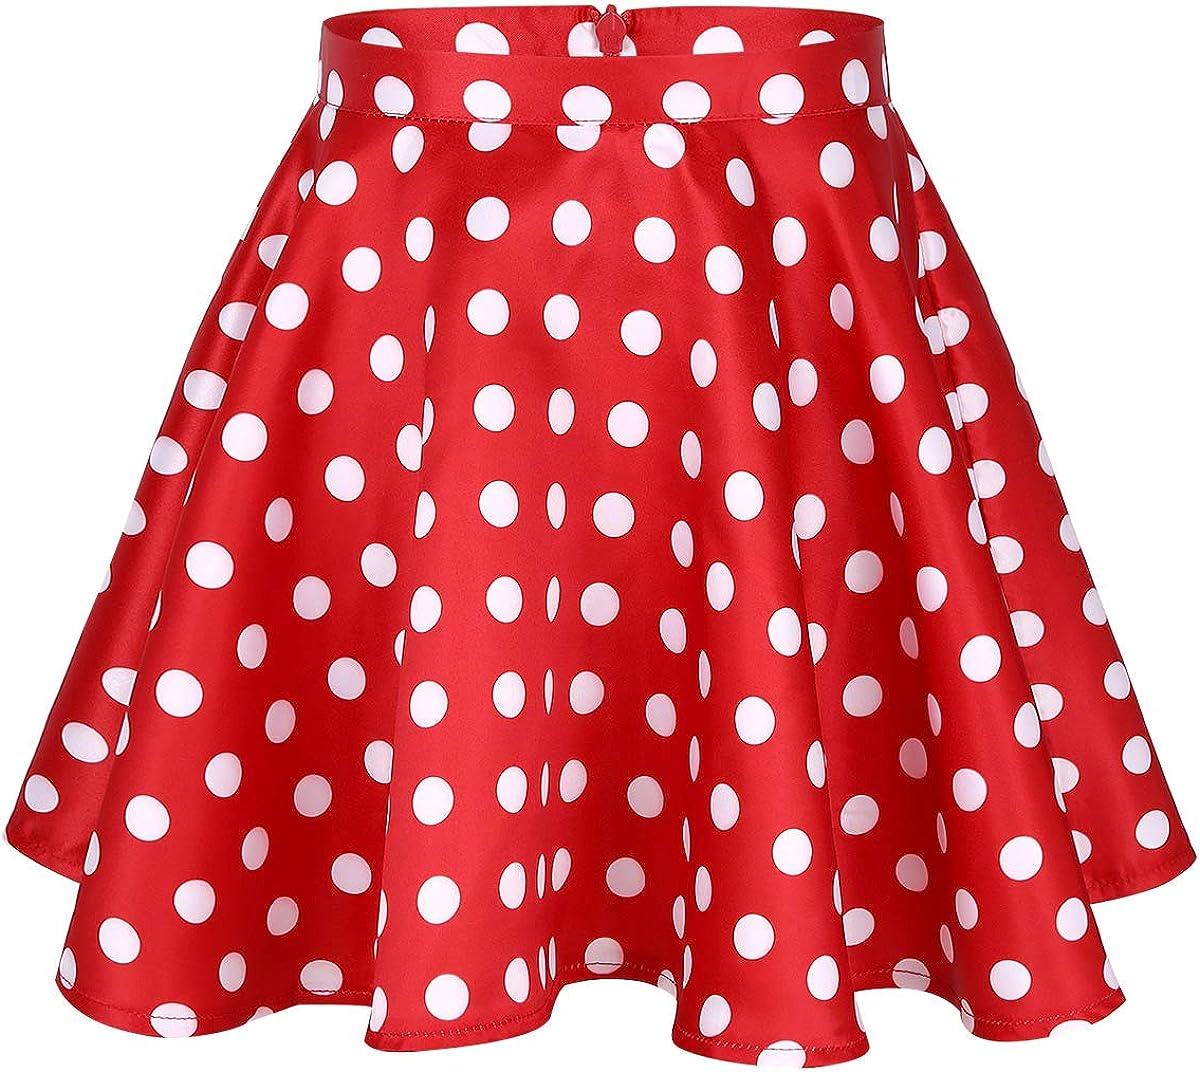 Yeahdor Big Girls Vintage 50s High Waisted Polka Dots Full Circle A-Line Flared Swing Skirt Dance Party Skater Skort